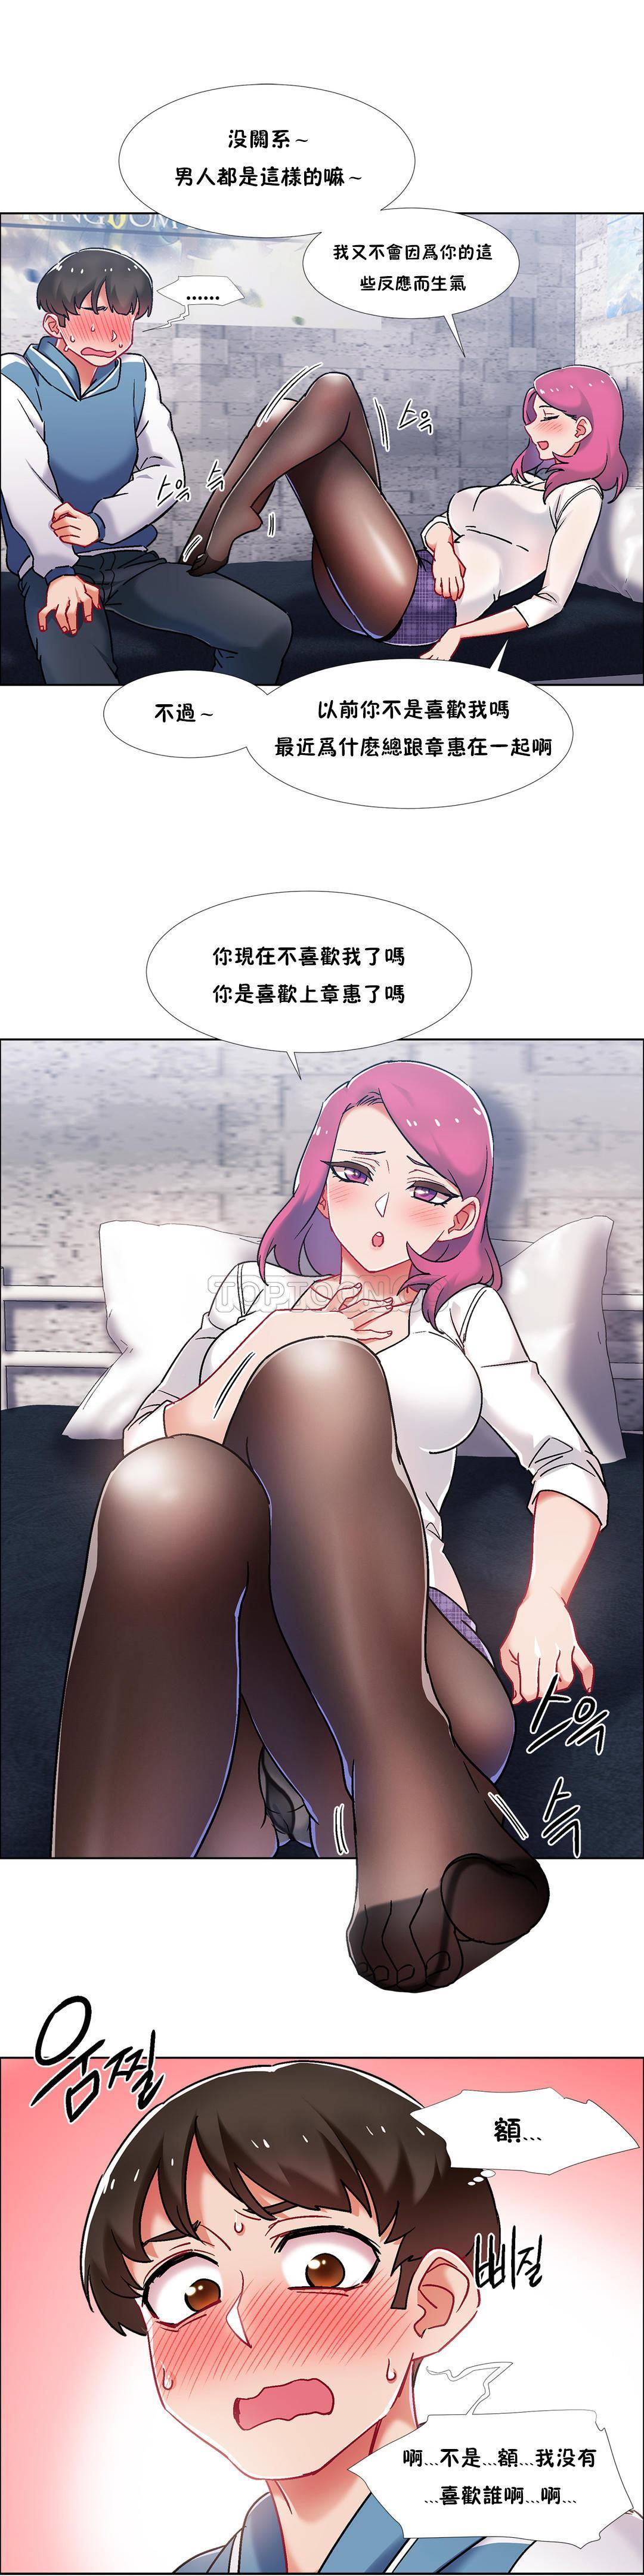 [Studio Wannabe] Rental Girls | 出租女郎 Ch. 33-58 [Chinese]  第二季 完结 163